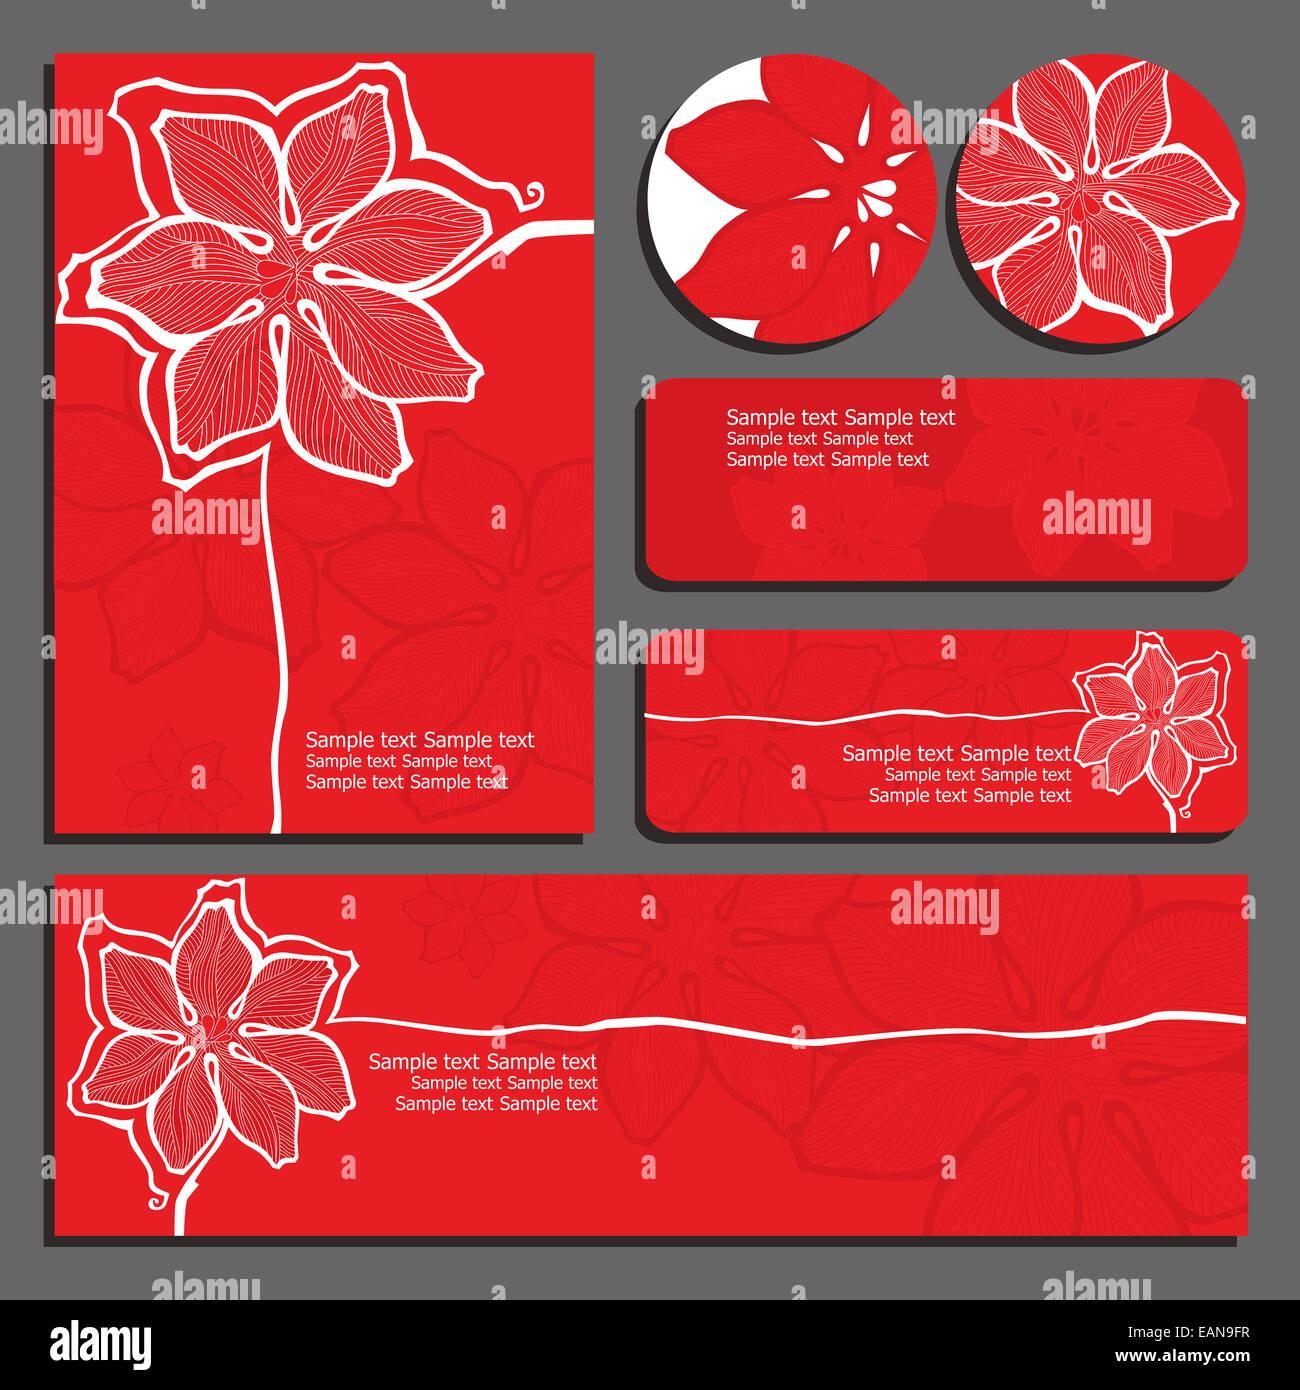 Chinese Wedding Invitations Stock Photos & Chinese Wedding ...